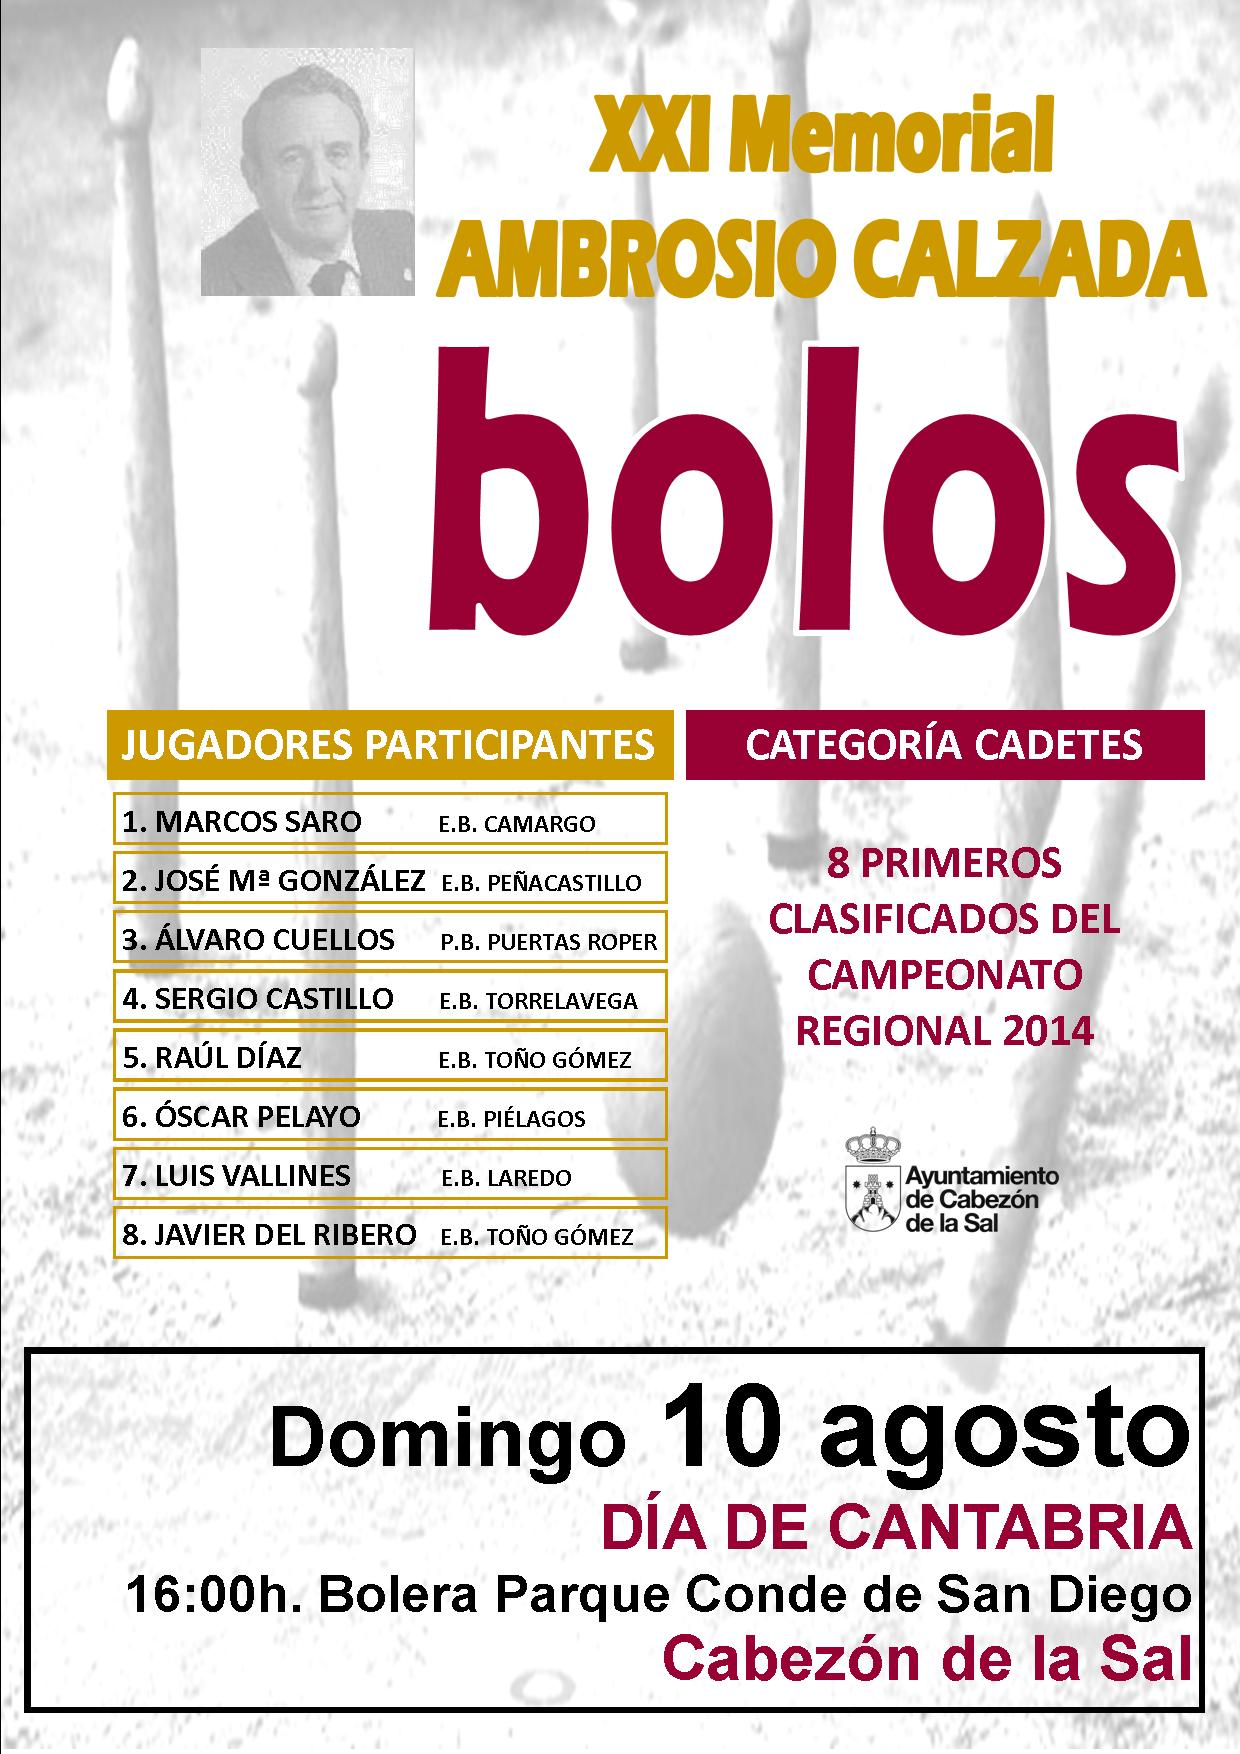 http://www.cabezondelasal.net/wp-content/uploads/2014/08/cartel-bolos-d%C3%ADa-cantabria-2014.jpg